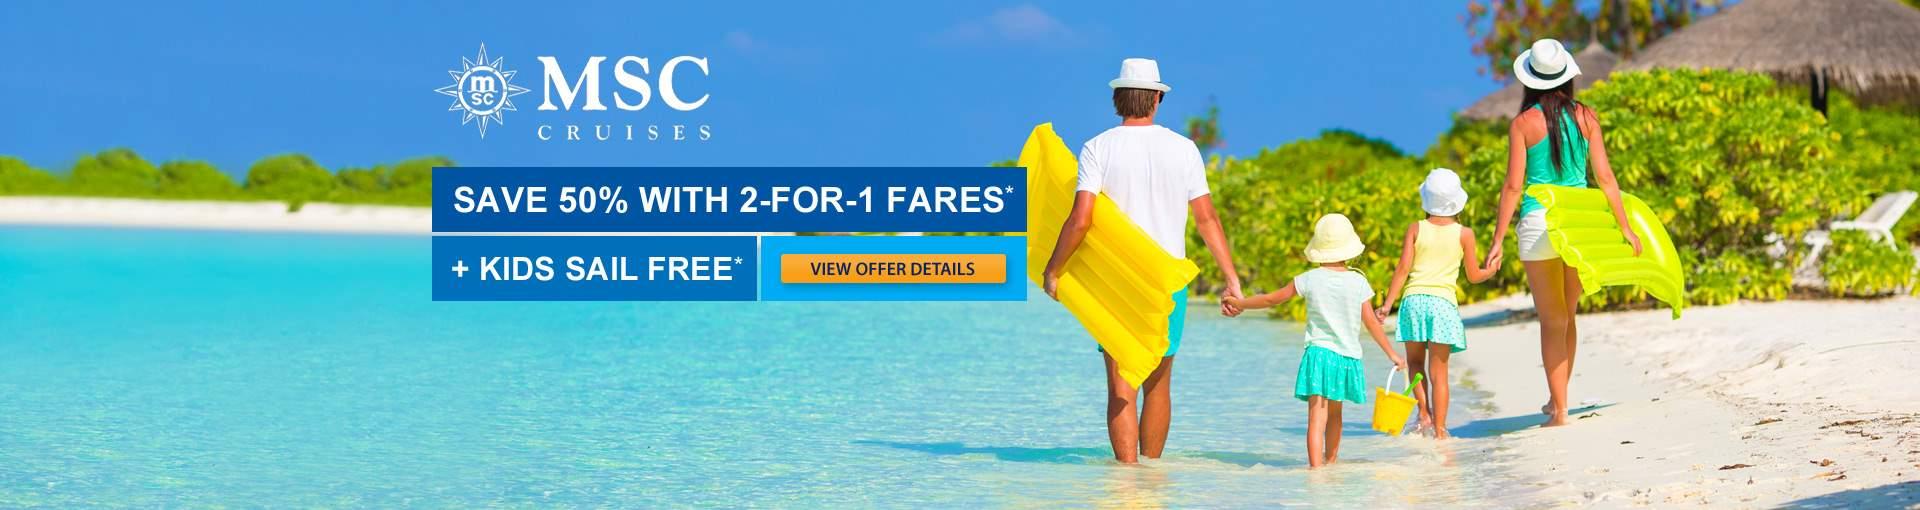 MSC Cruises 2-for-1 Cruises plus Kids Sail FREE*